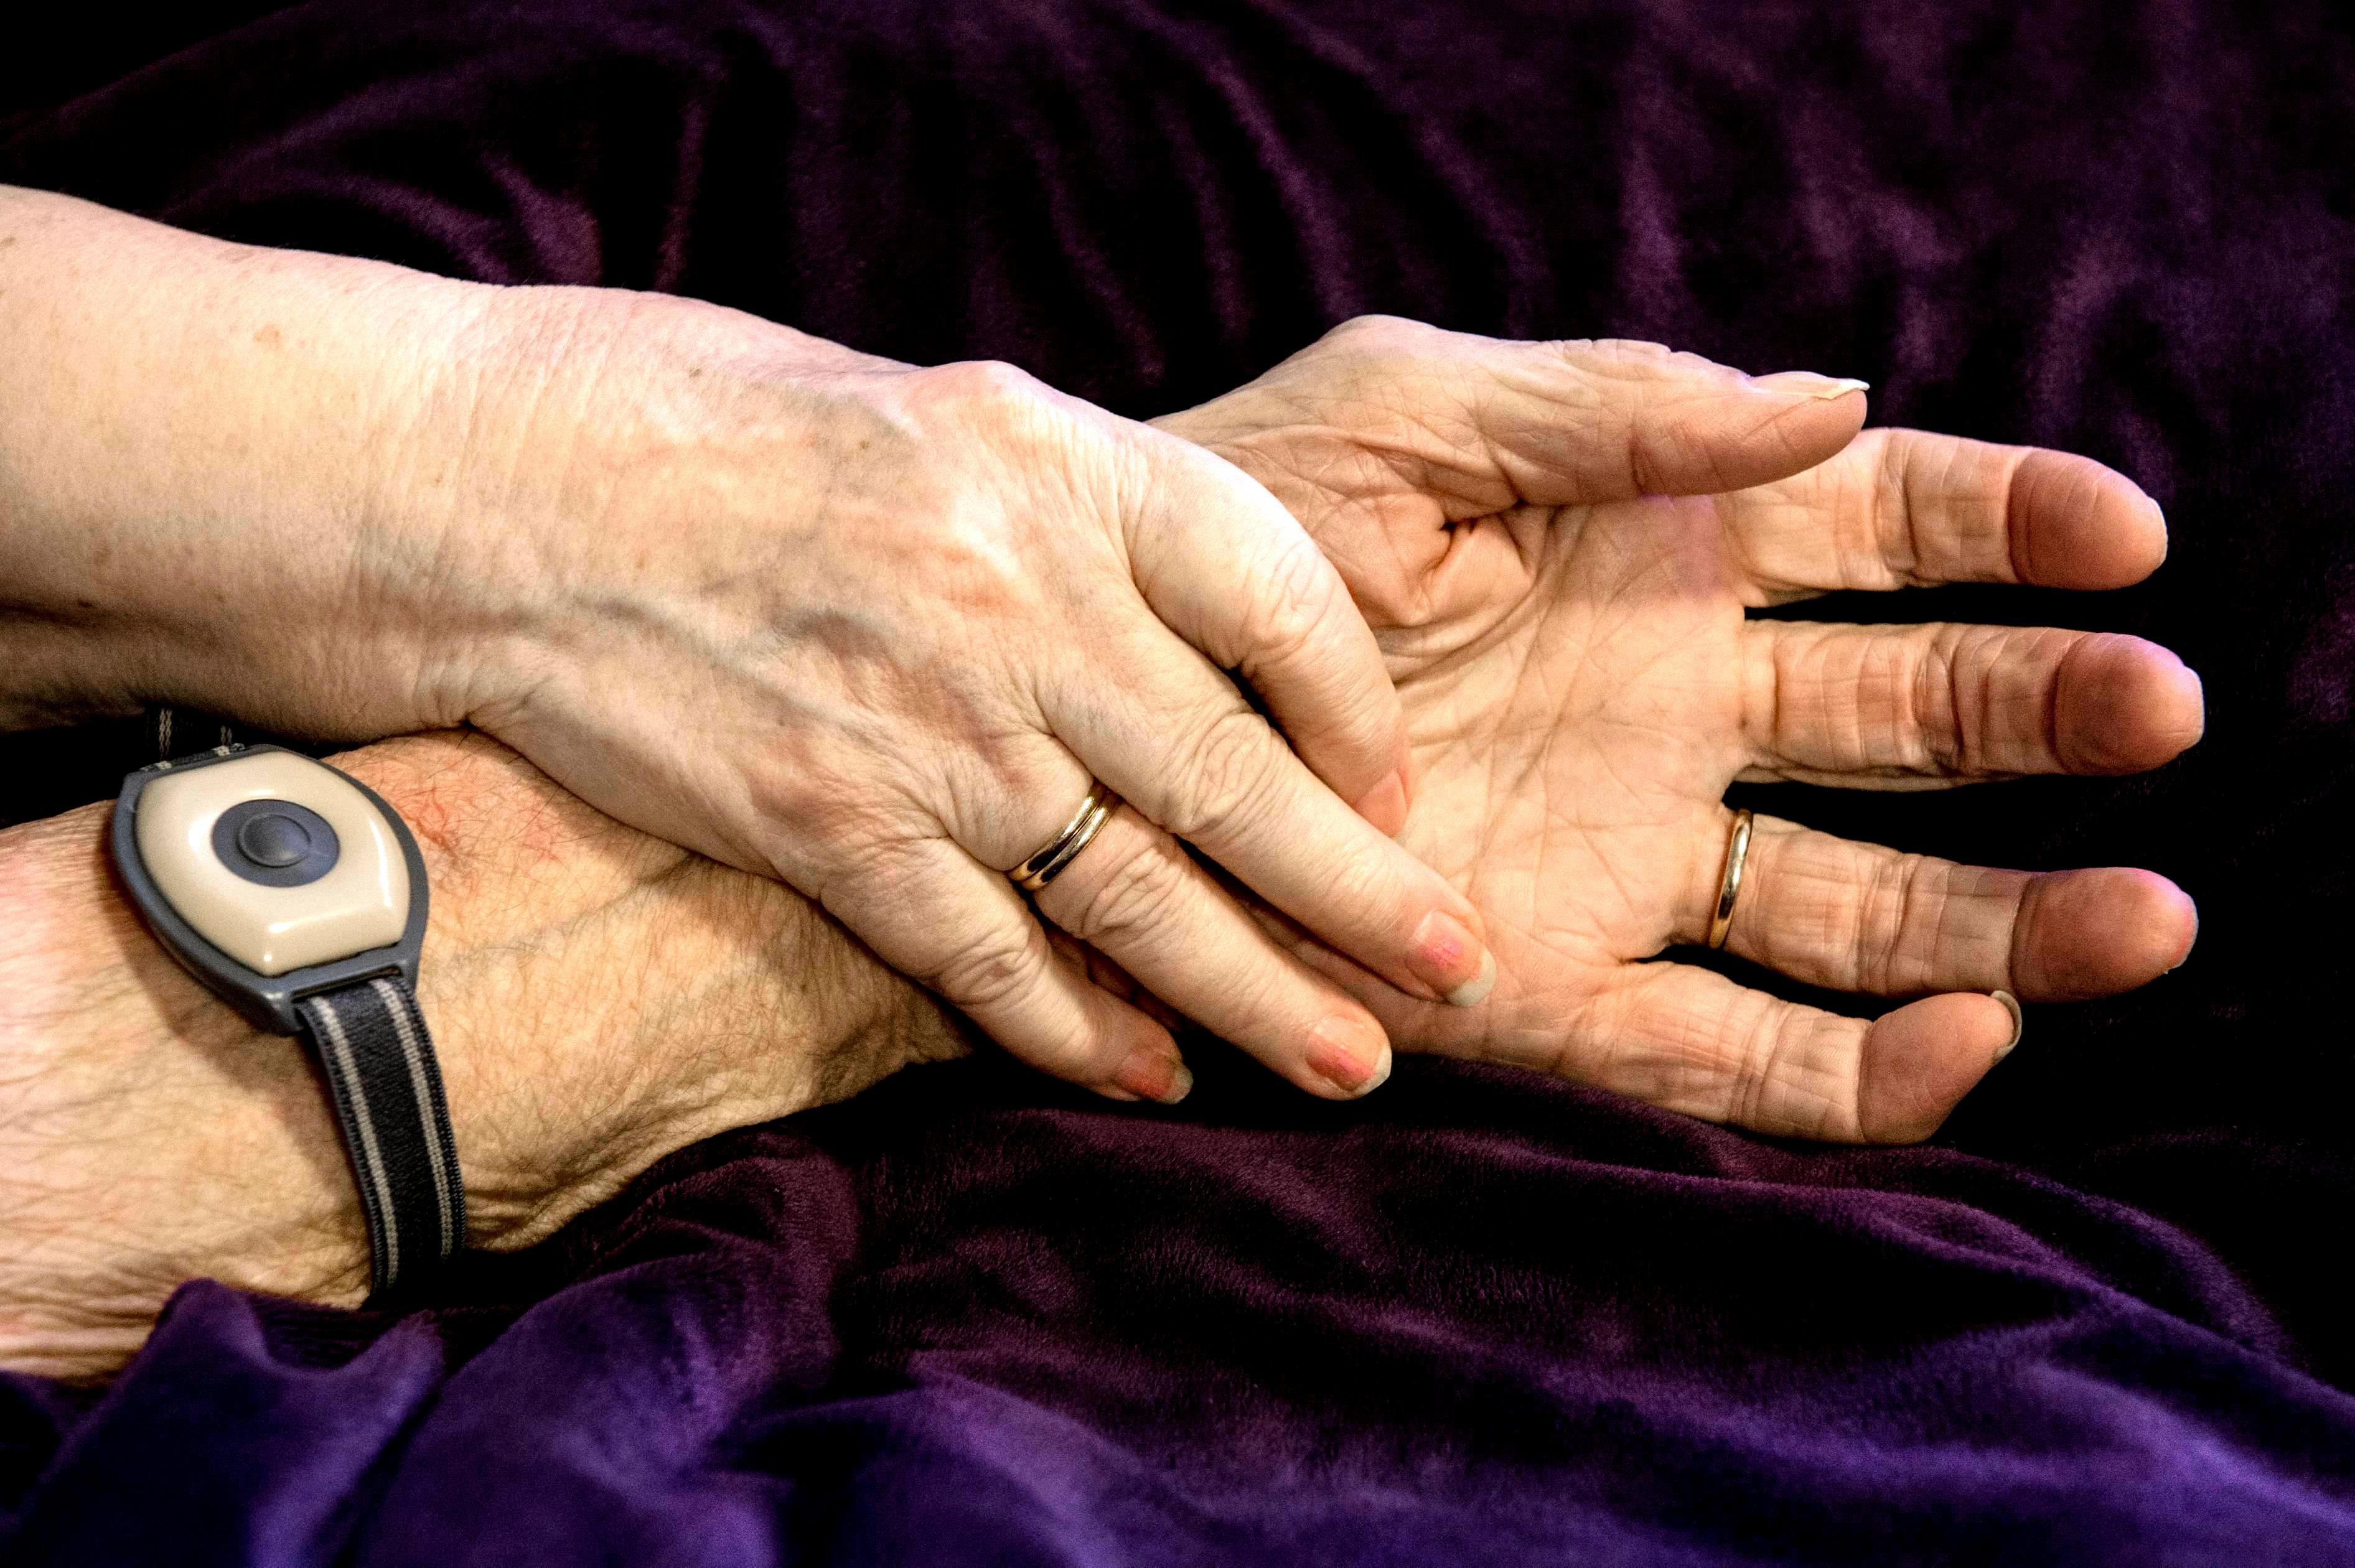 nätdejting gratis massage maskin